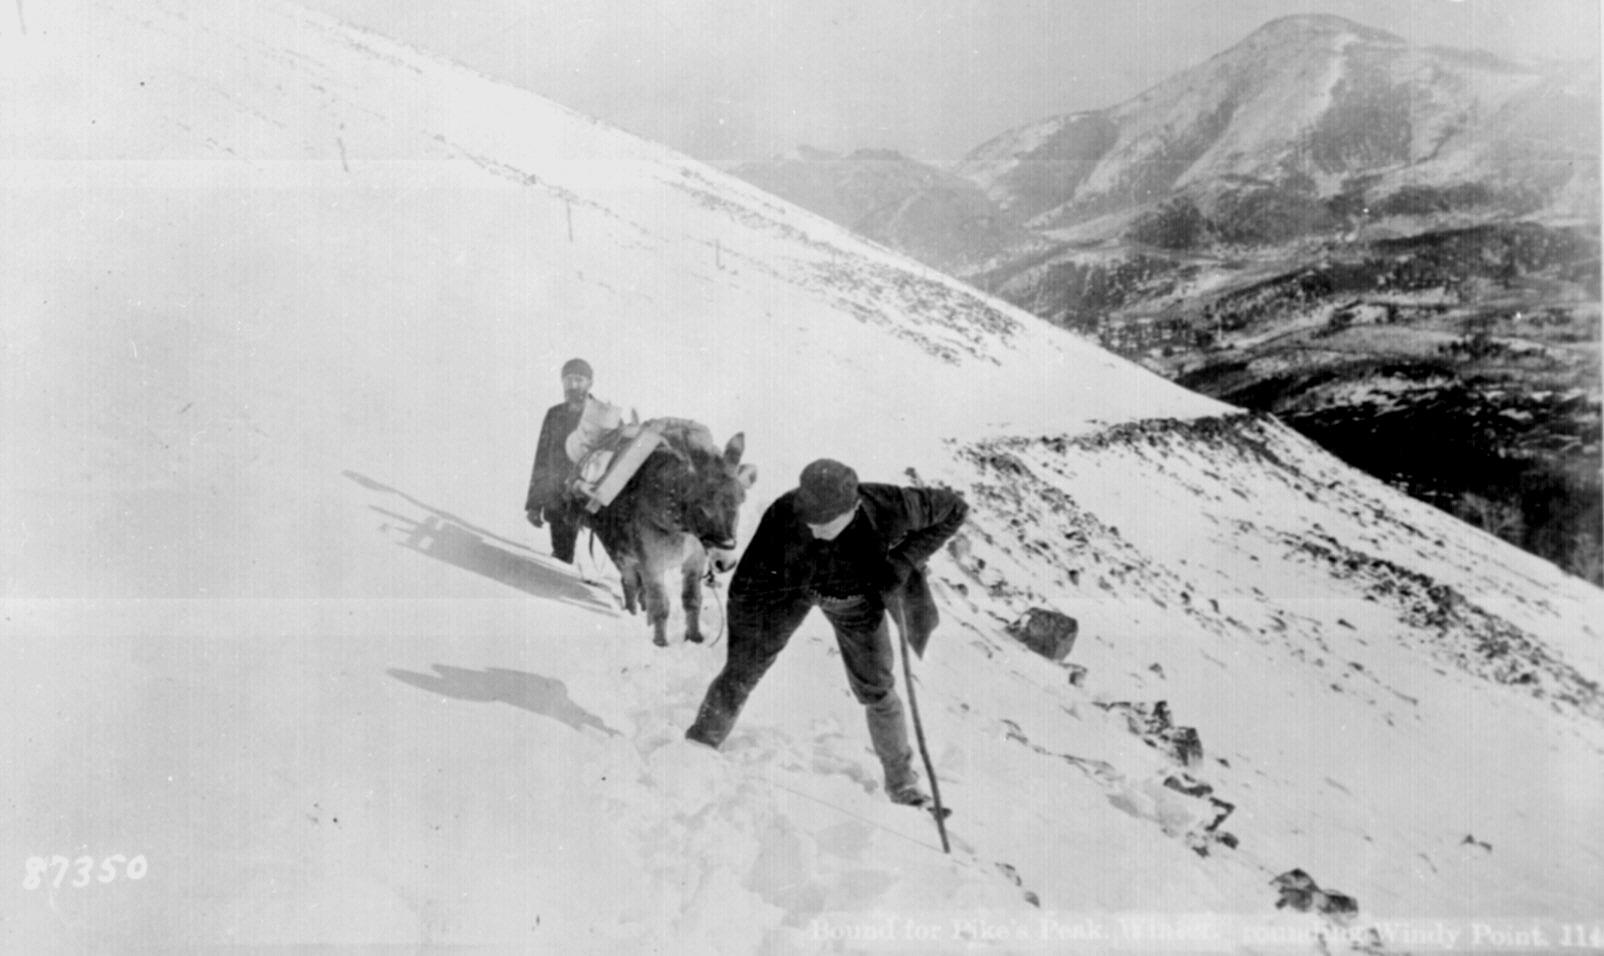 Climbing Pikes Peak, Colorado, in winter, rounding Windy Point, ca. 1890.